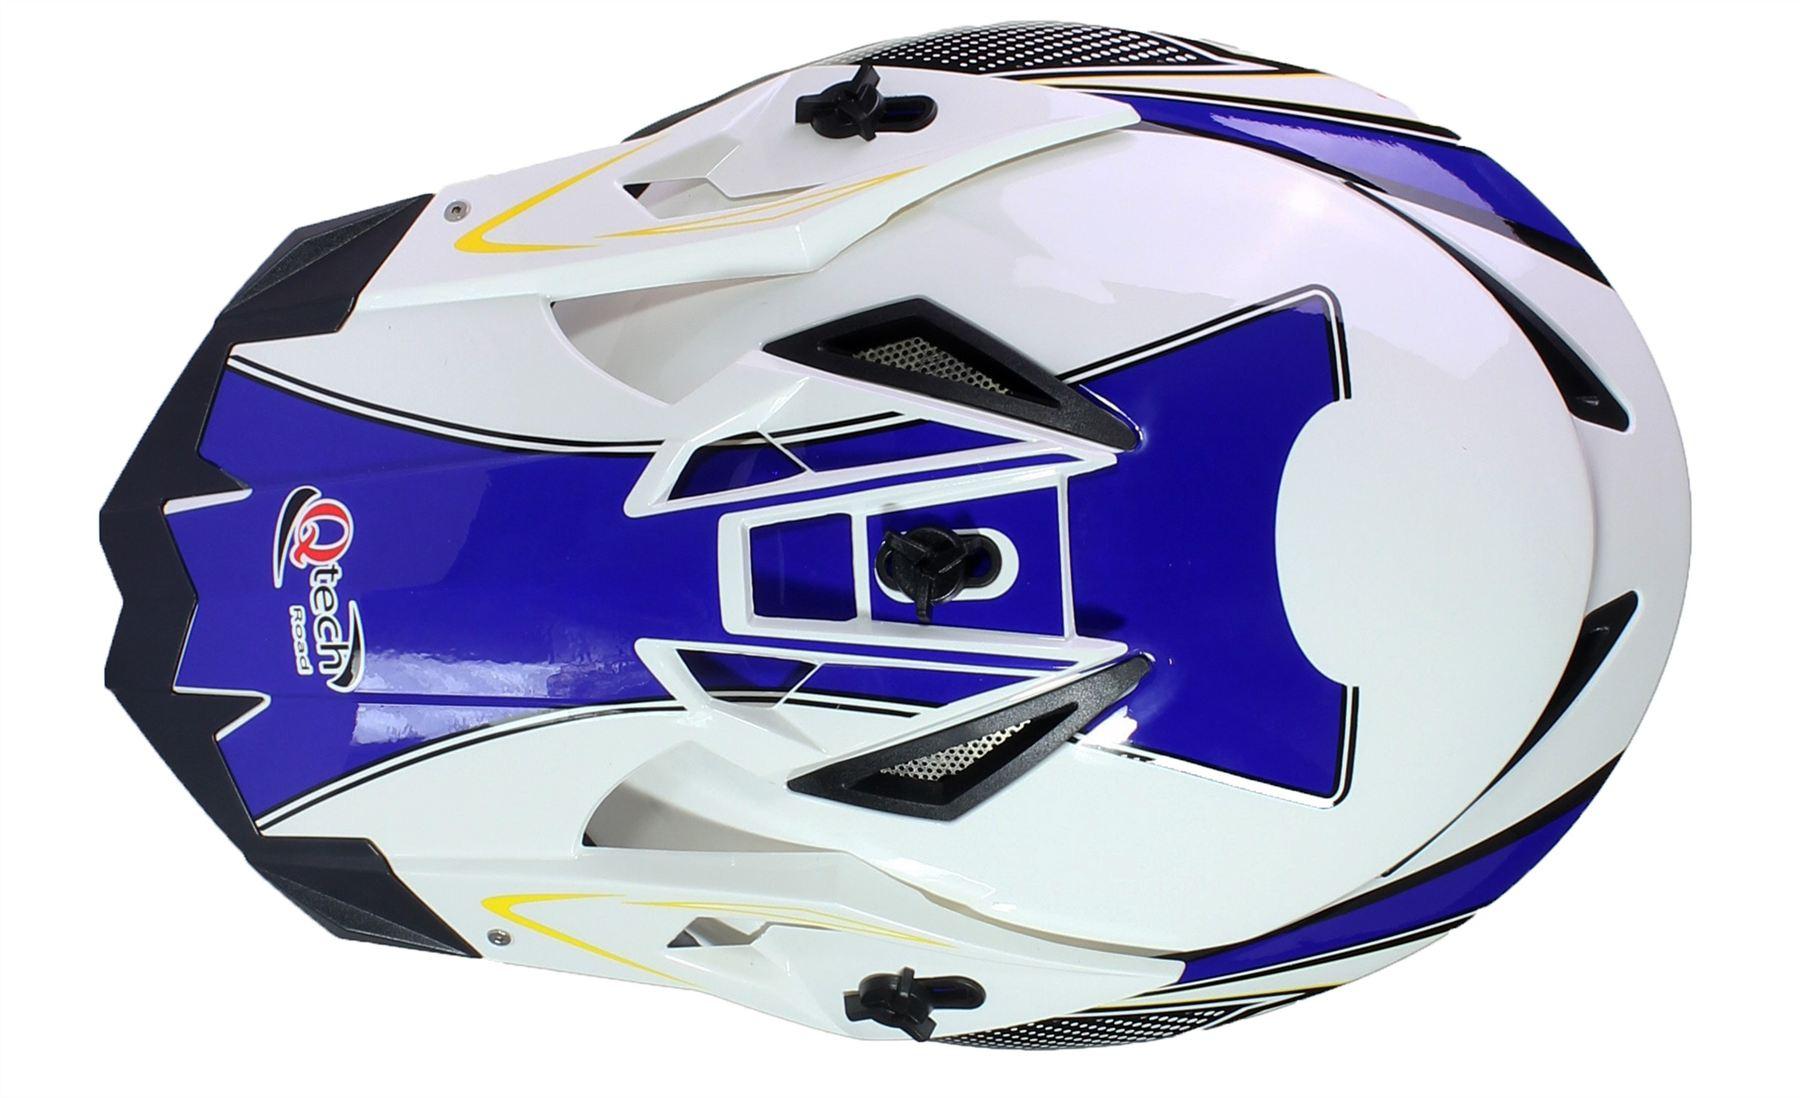 59-60cm Qtech Casque de Motocross Moto Helm Enduro Quad ATV FMX MTB MX L Noir